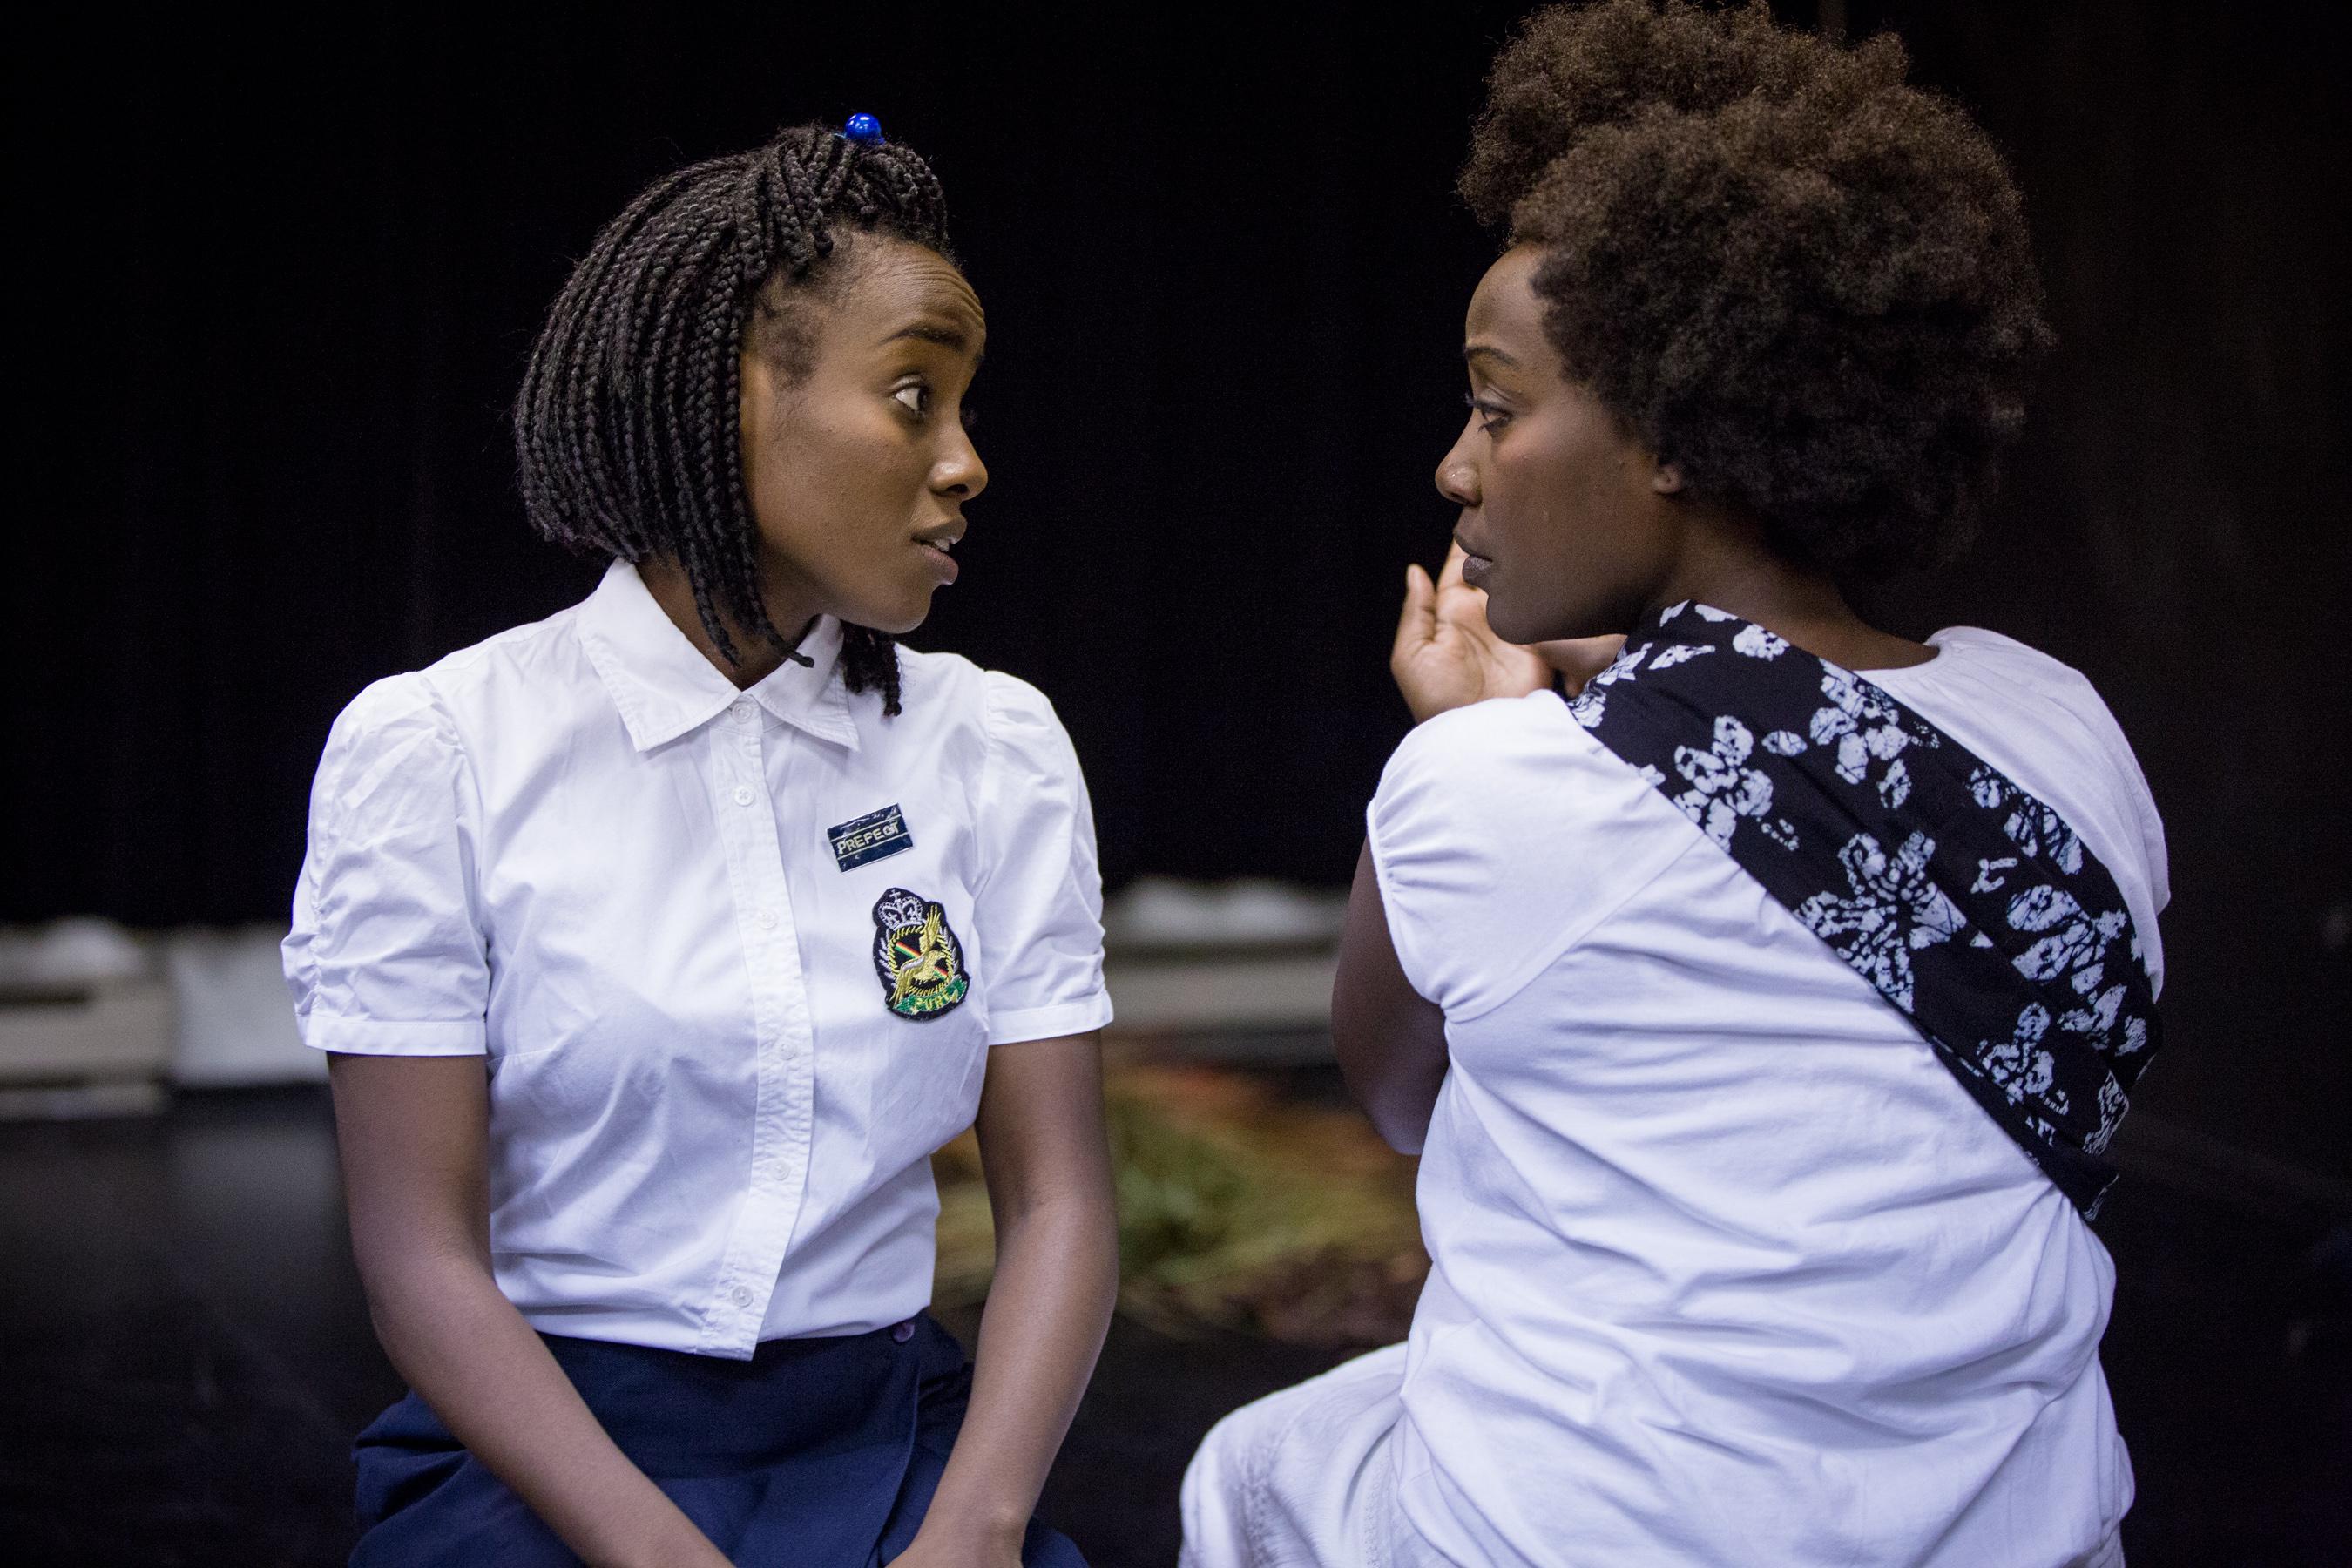 BWW Review: BINTI'S JOURNEY at Black Theatre Workshop